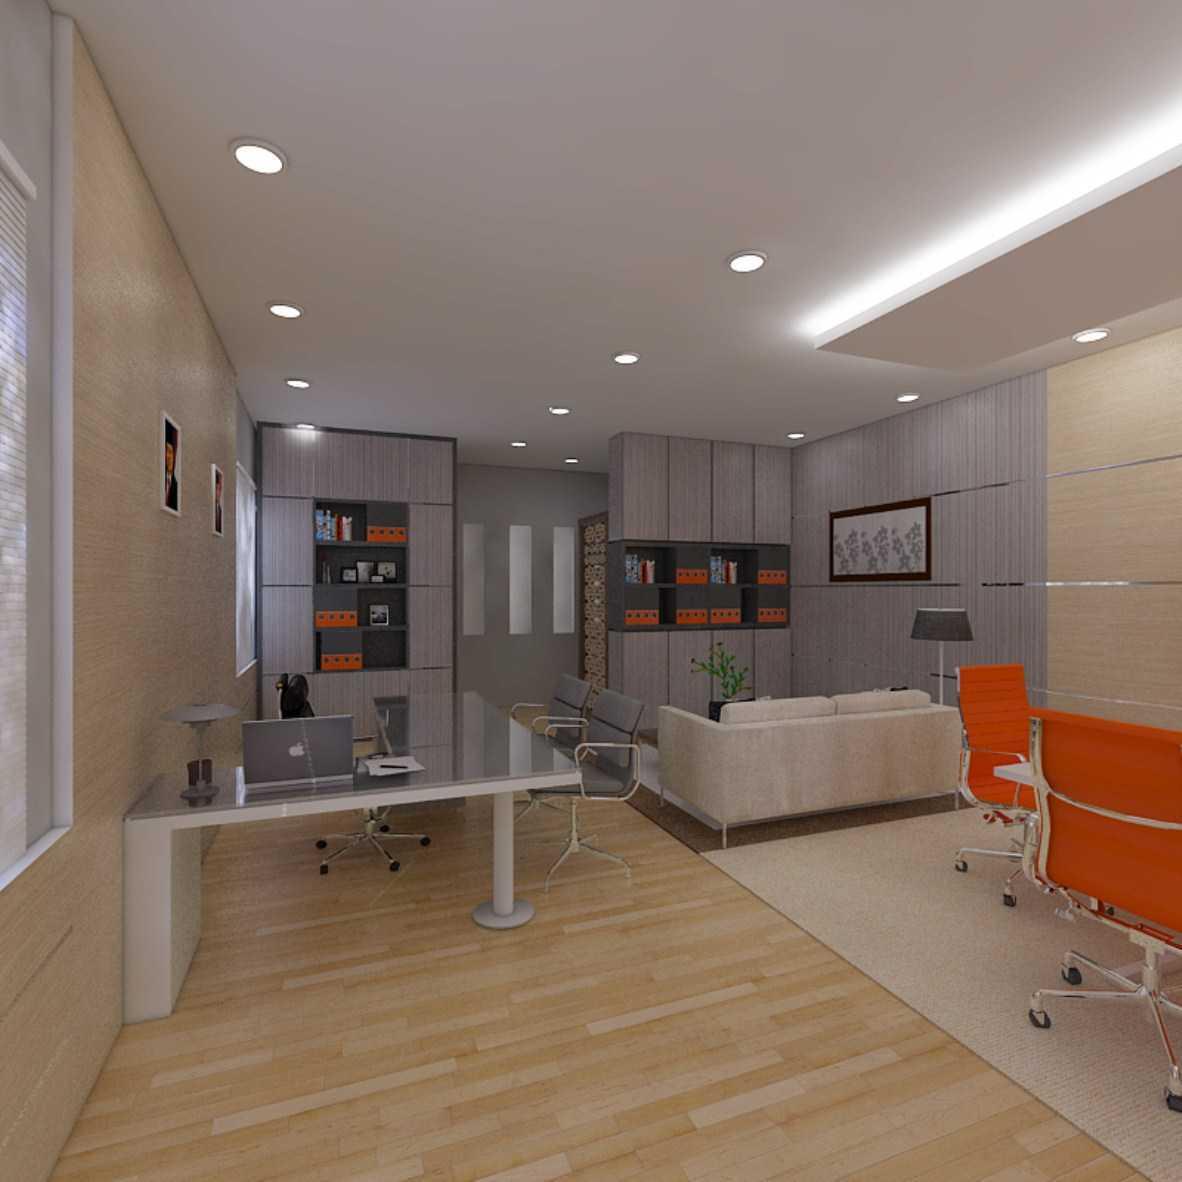 Arsindo Cipta Karya Bbp2Tp Office Project Jakarta Jakarta Office Room Modern 26834